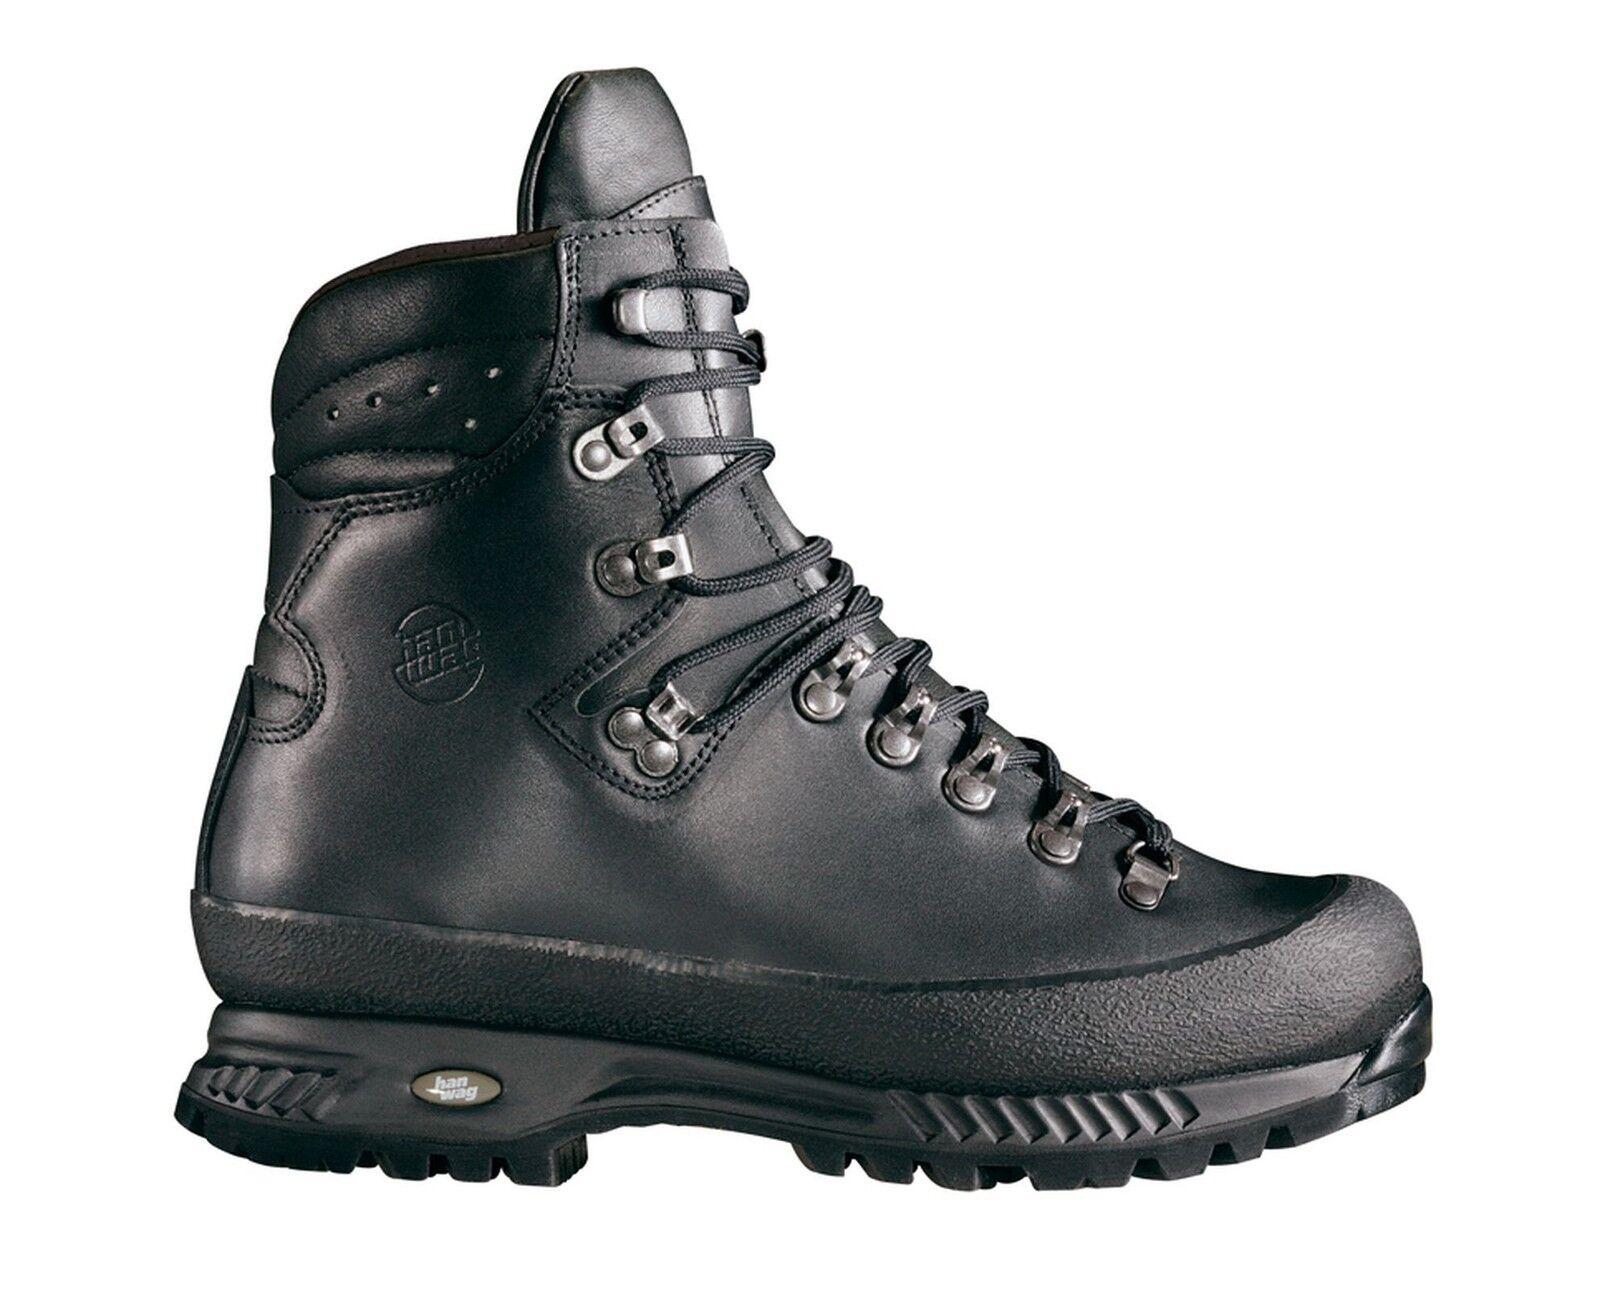 Hanwag KSK  Yukon Men Cuir Größe 12,5 - 48 schwarz